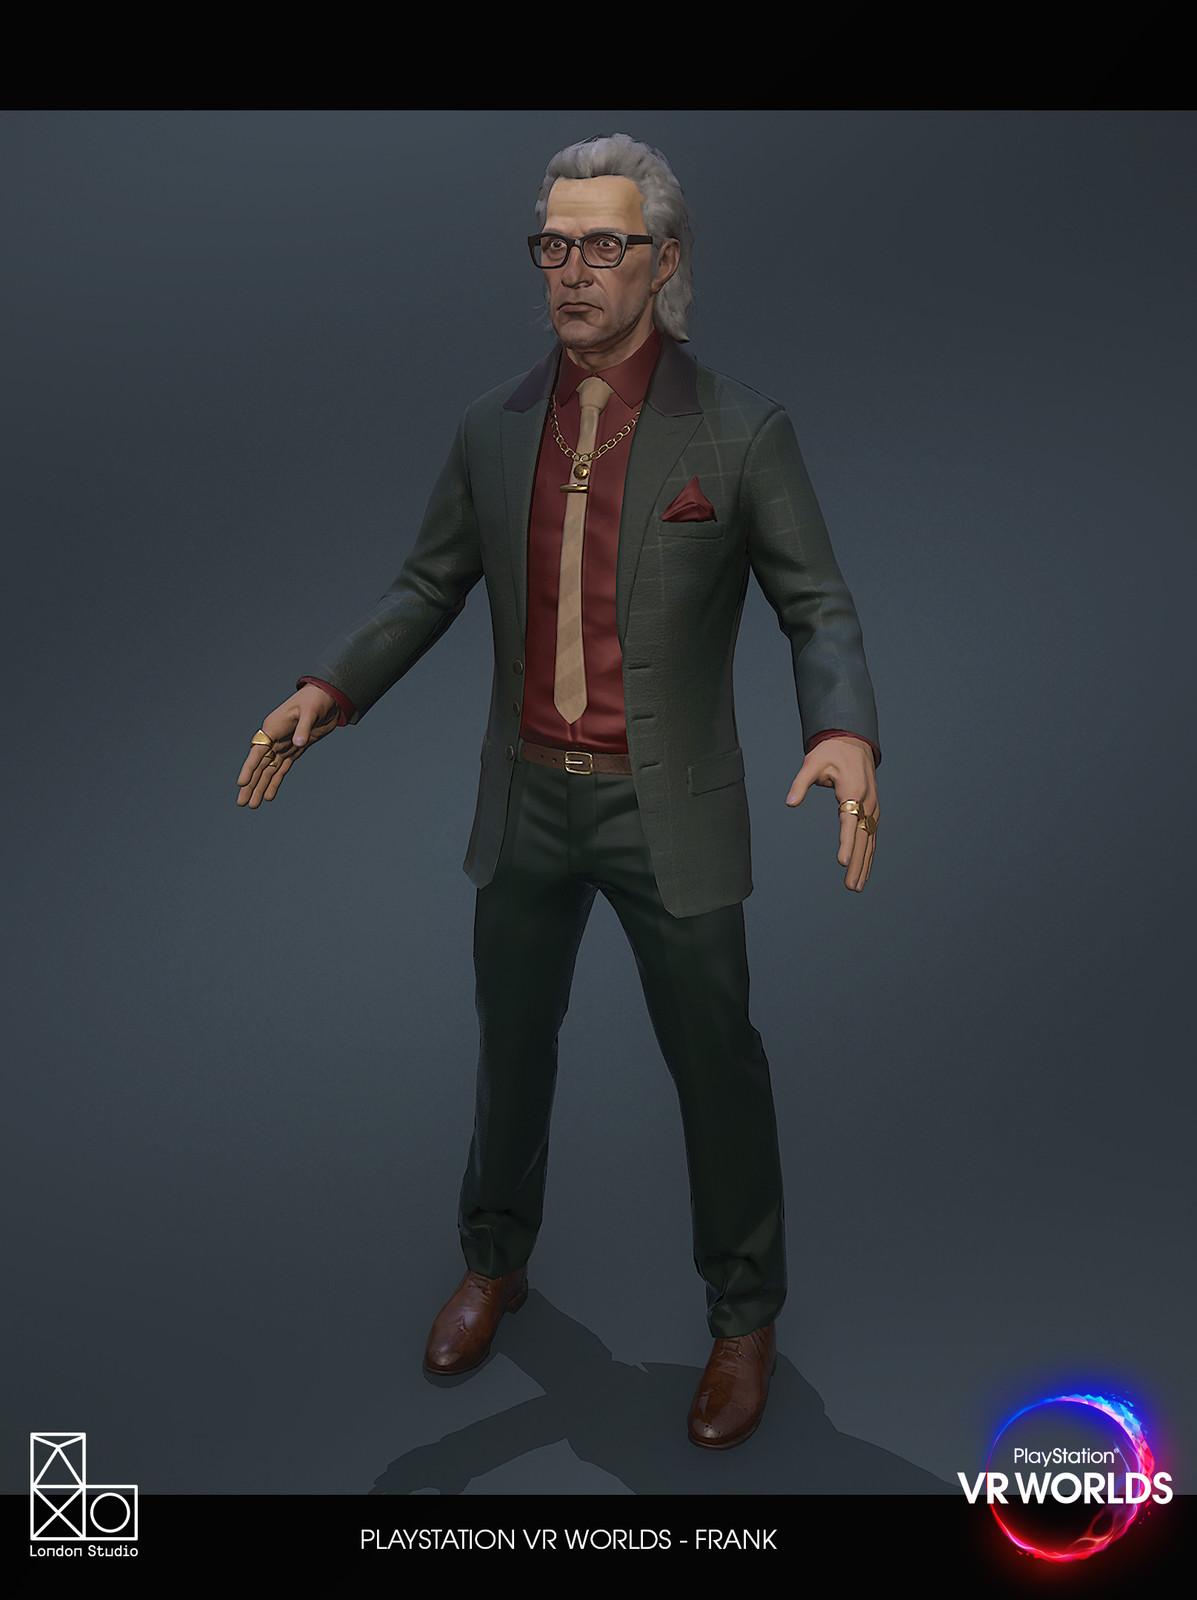 Frank, London Heist, in-game model